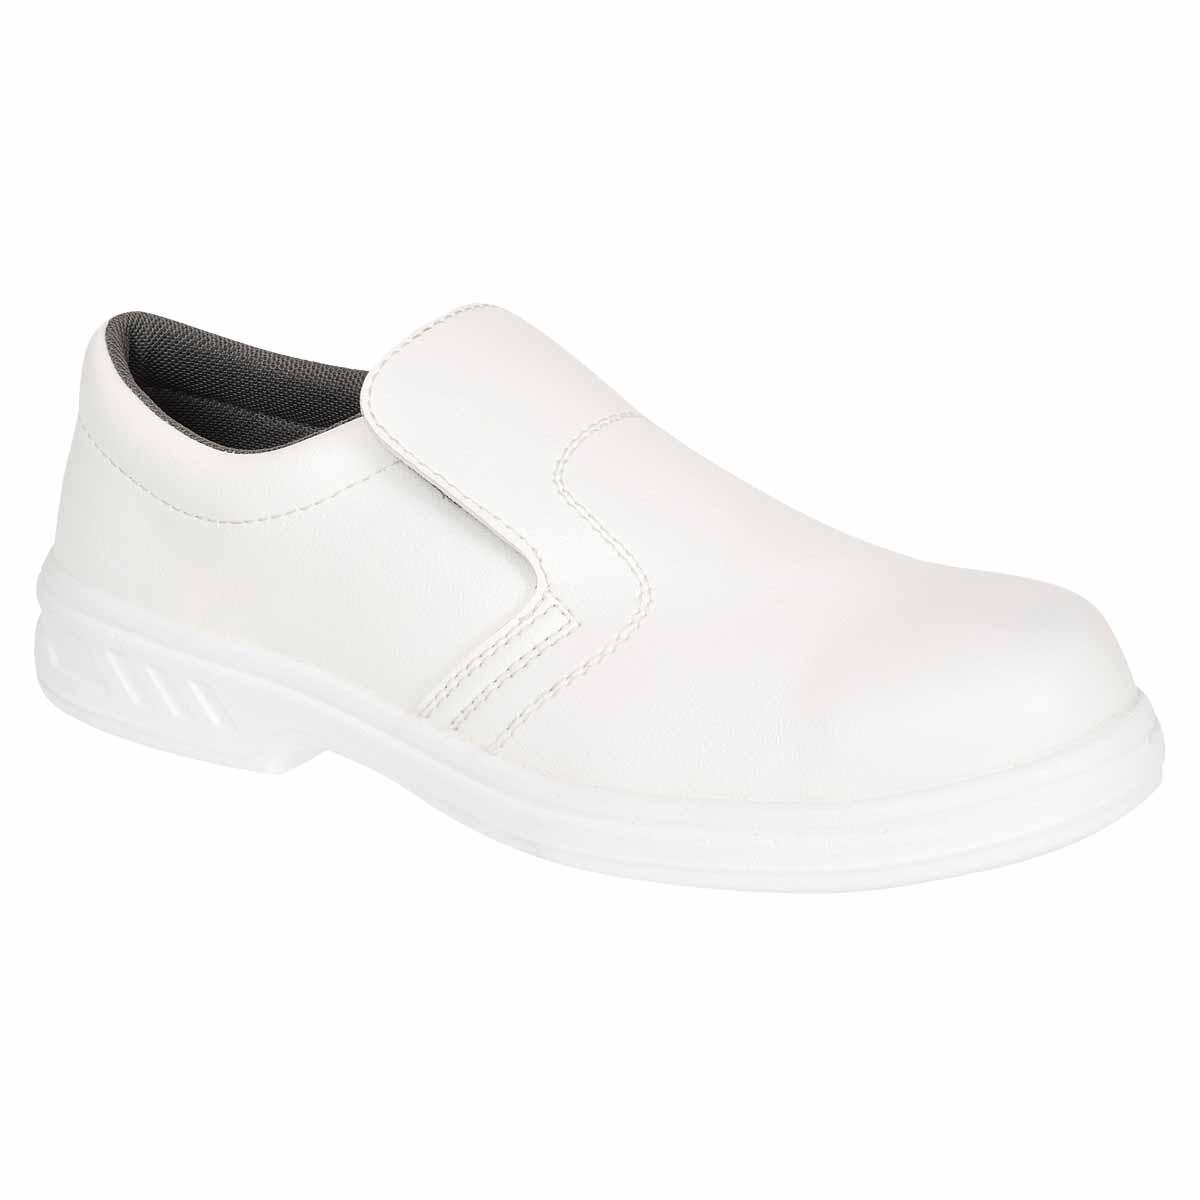 Occupational Slip On Shoe - FW58